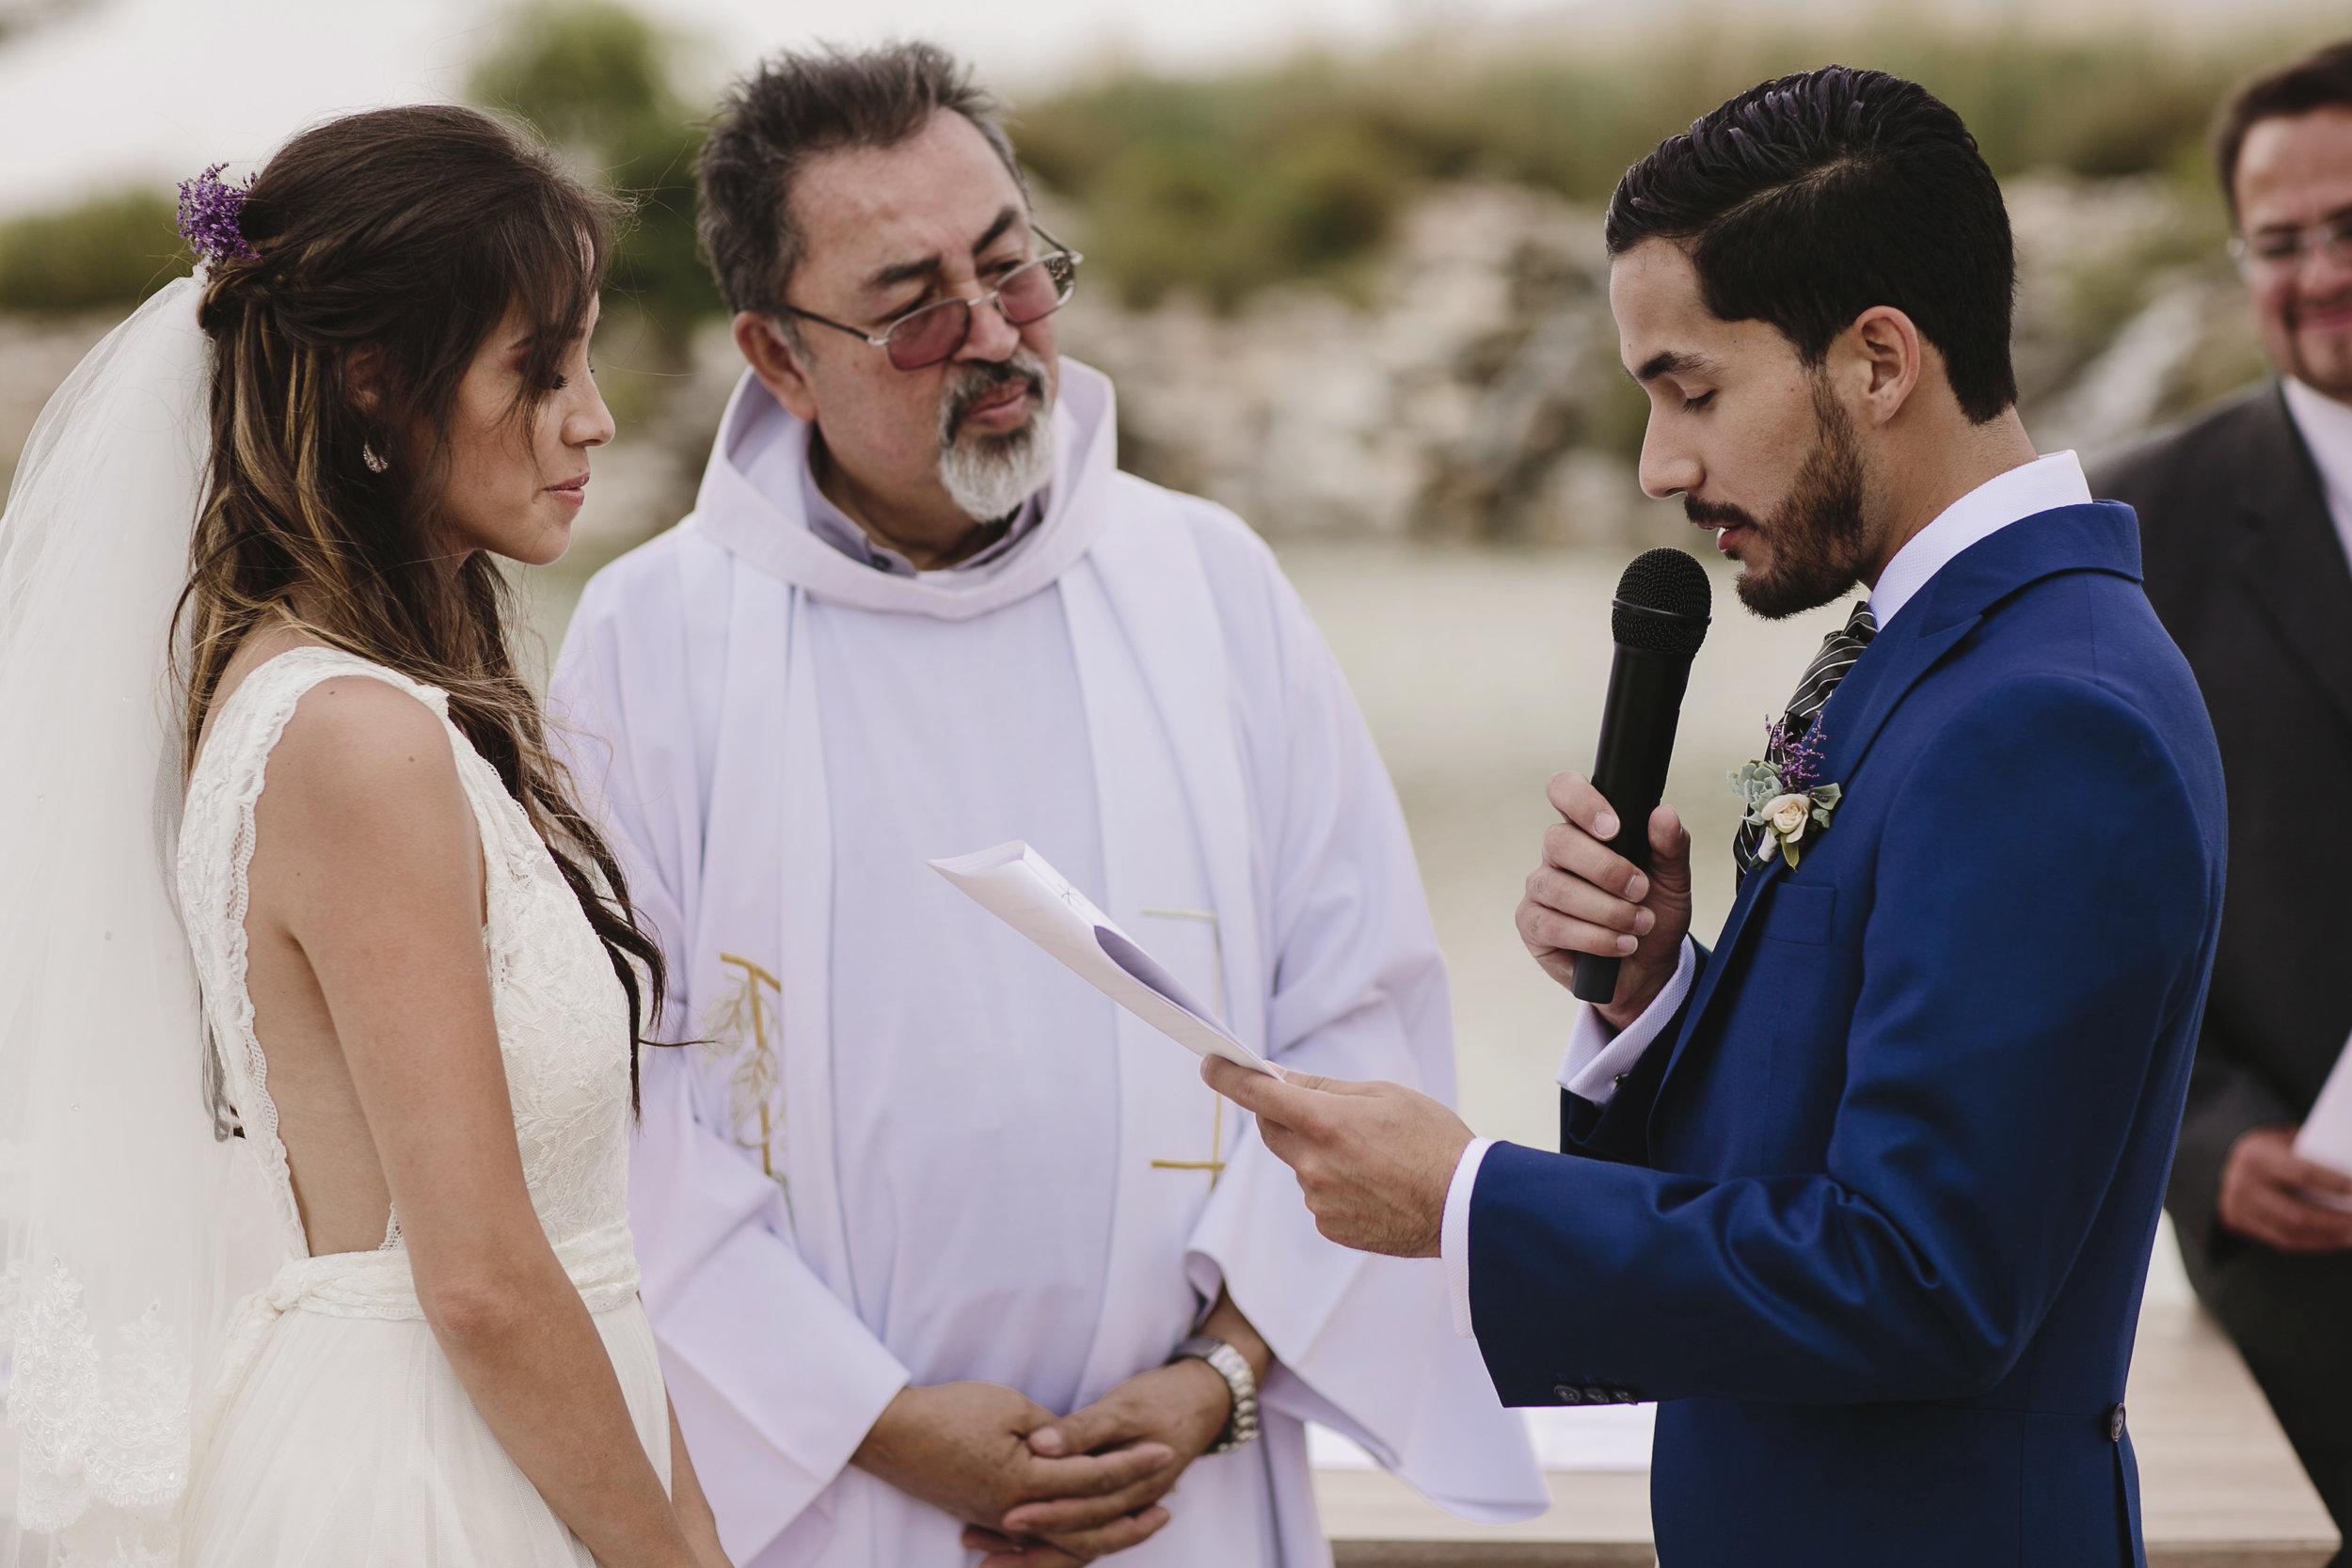 alfons_flores_destination_wedding_photography_mavi_david-1012.JPG